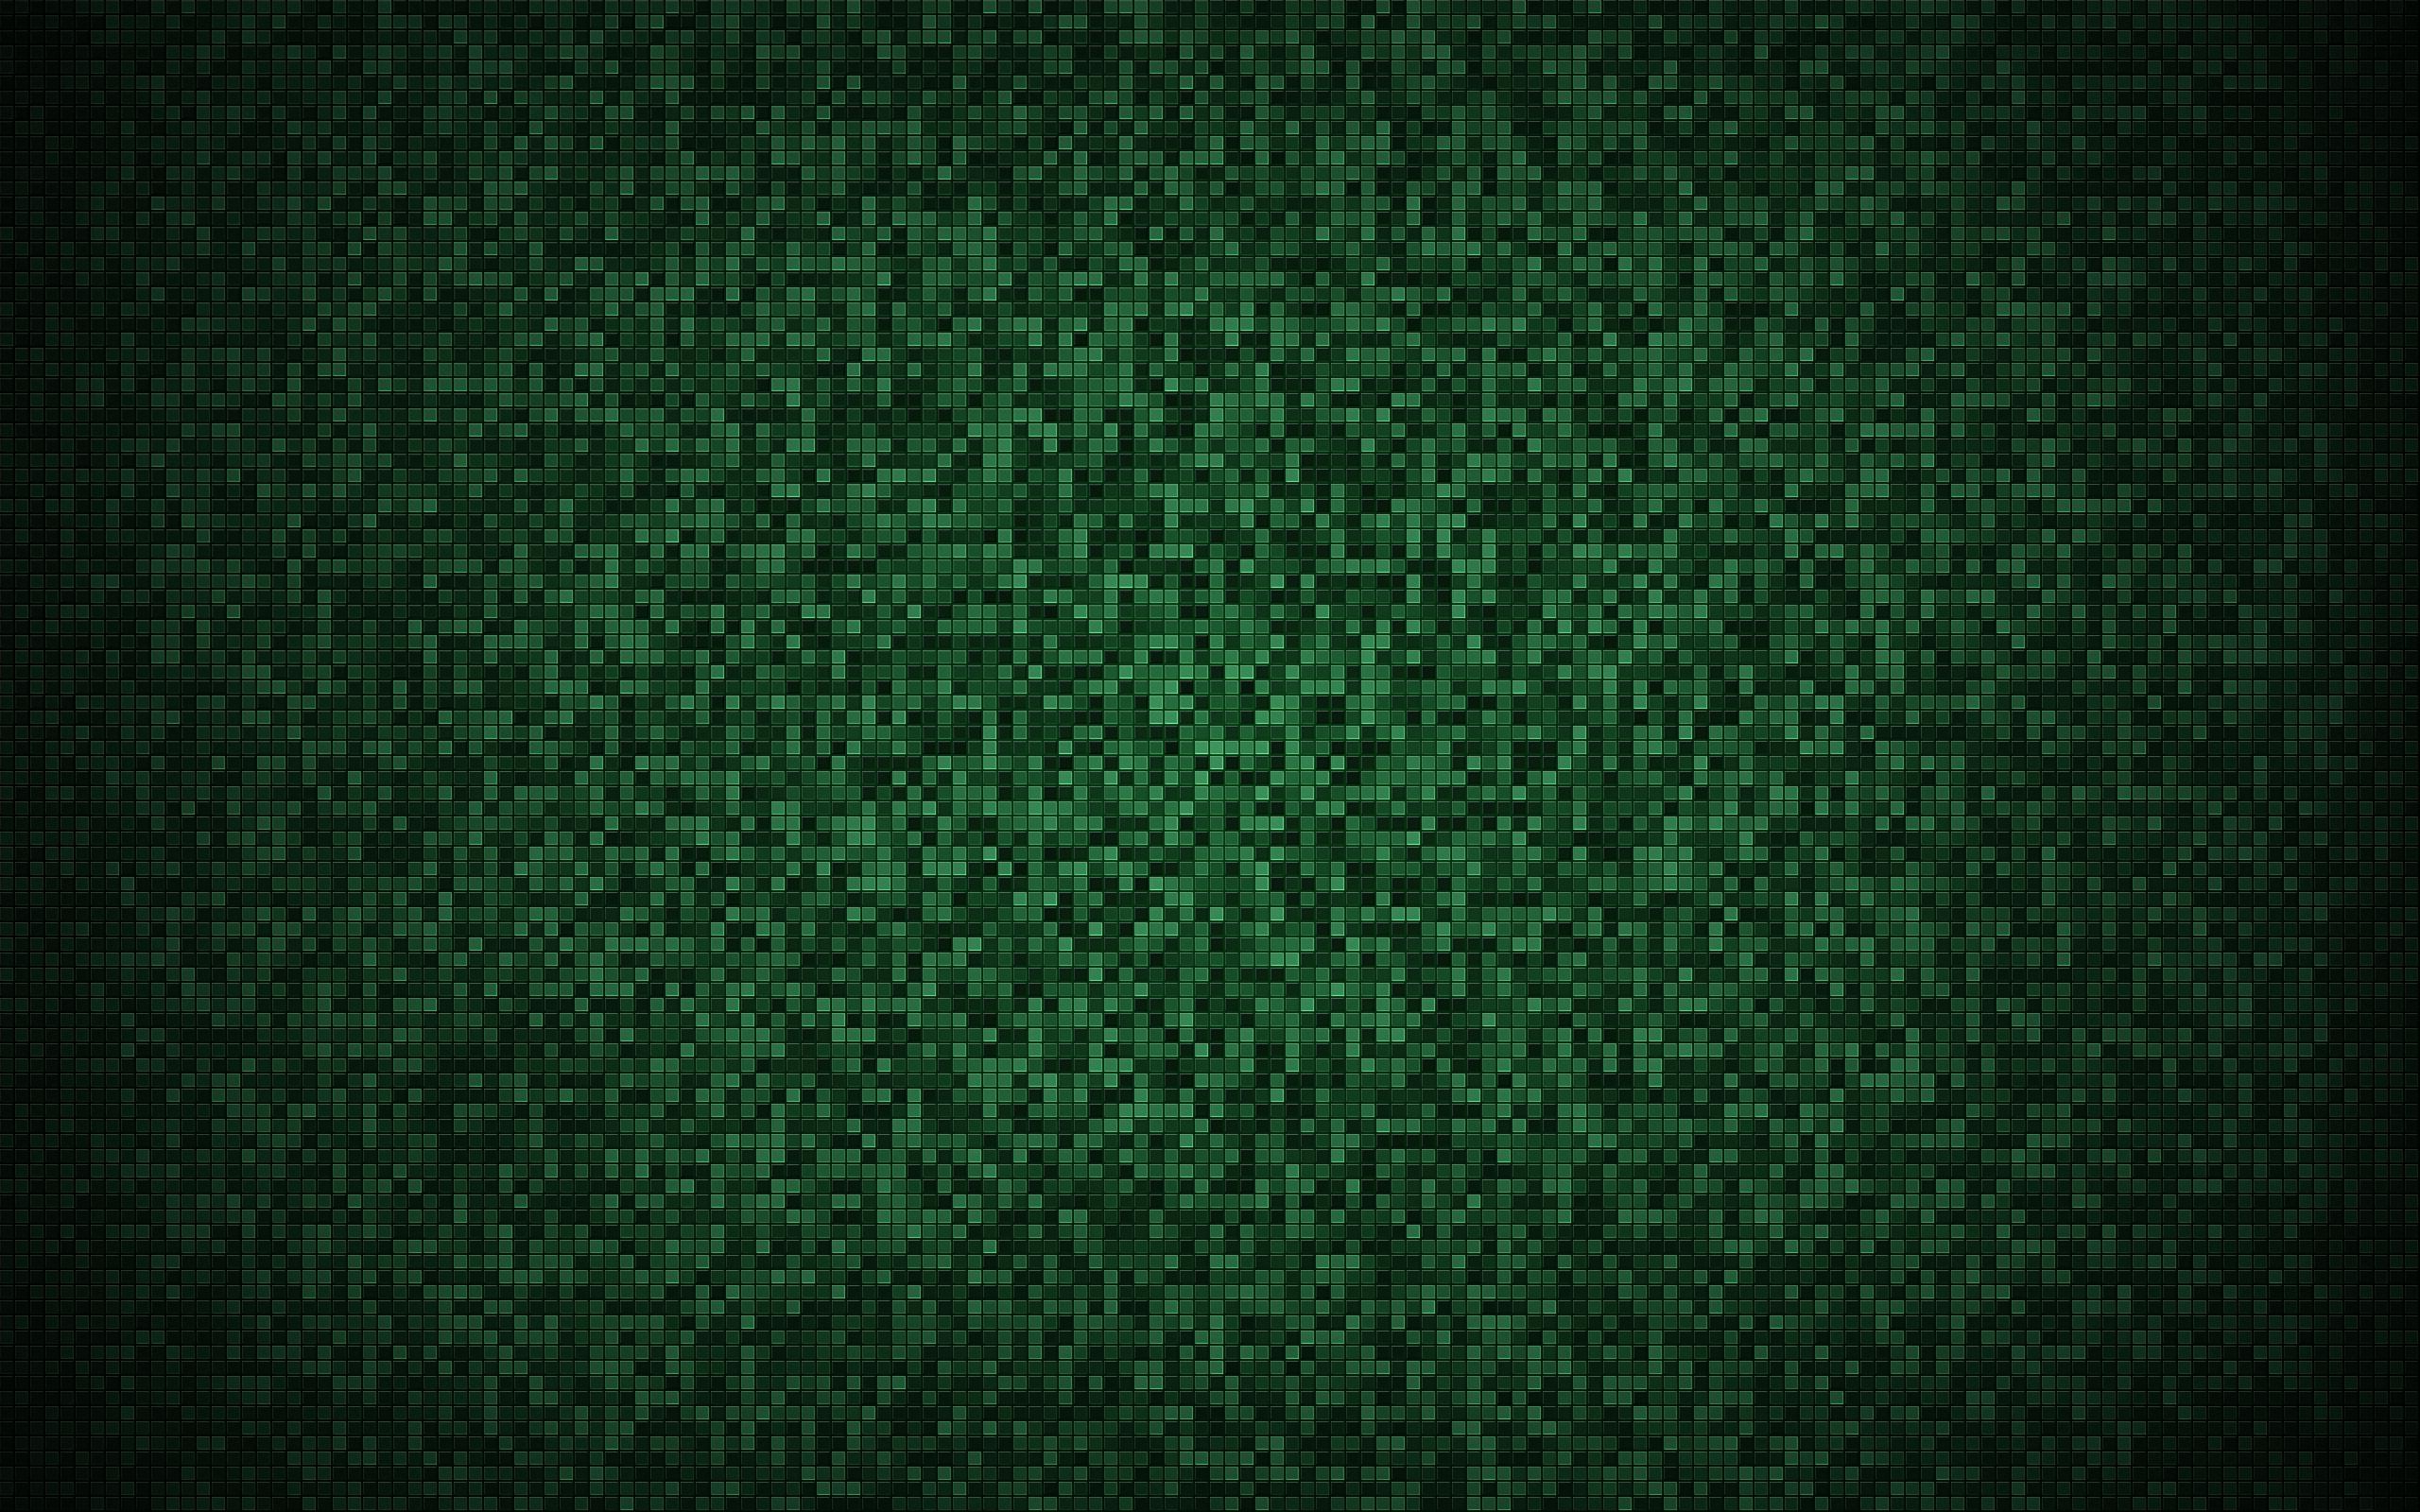 Patrón  - Squares  - Verde Fondo de Pantalla